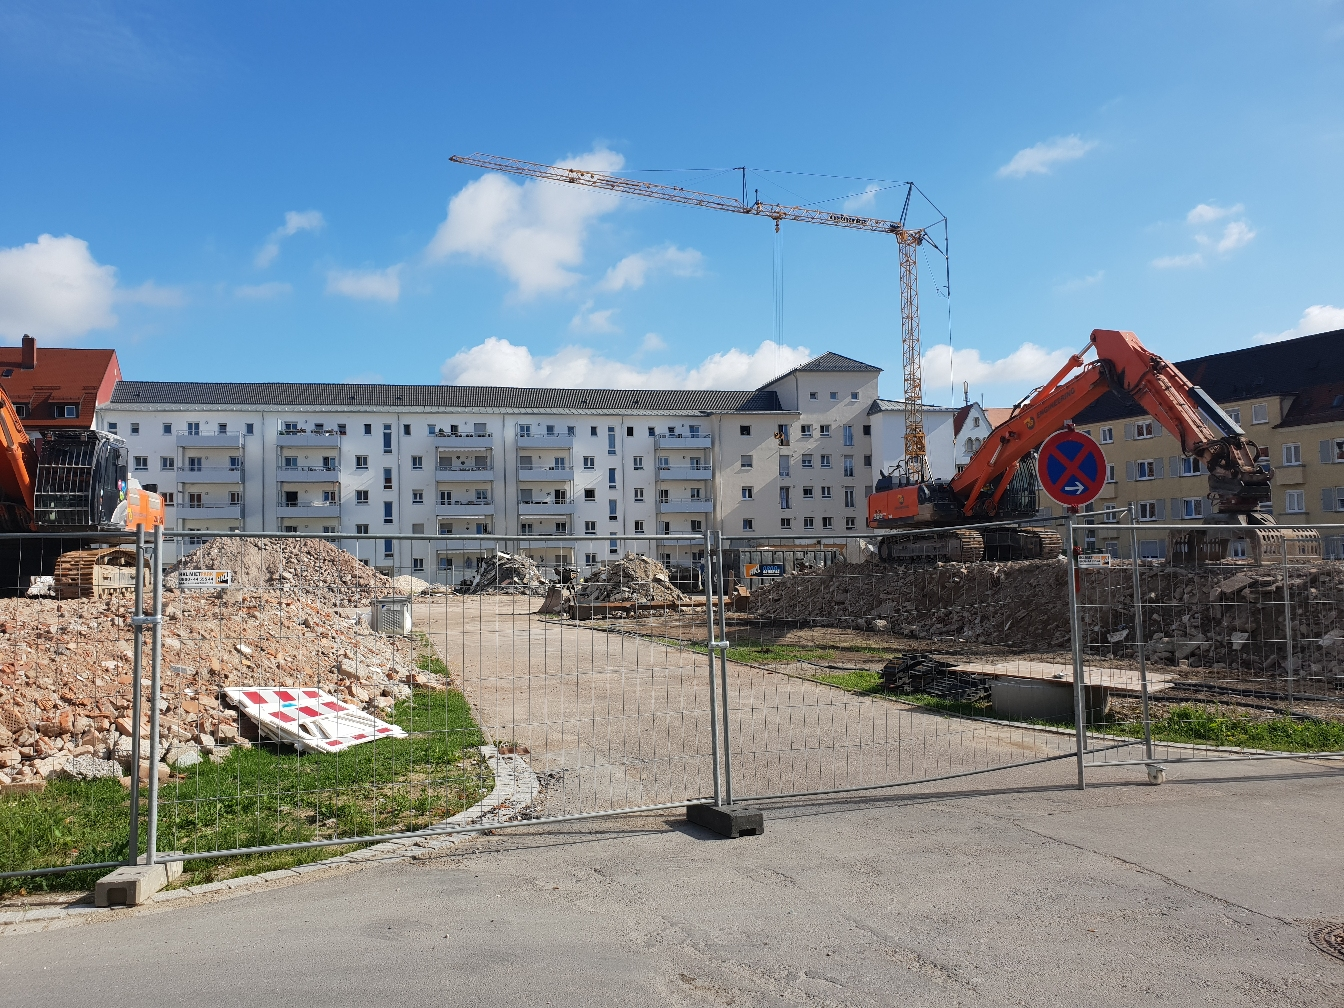 Ulm Abriss Postdörfle Wörthstraße Juni 2018